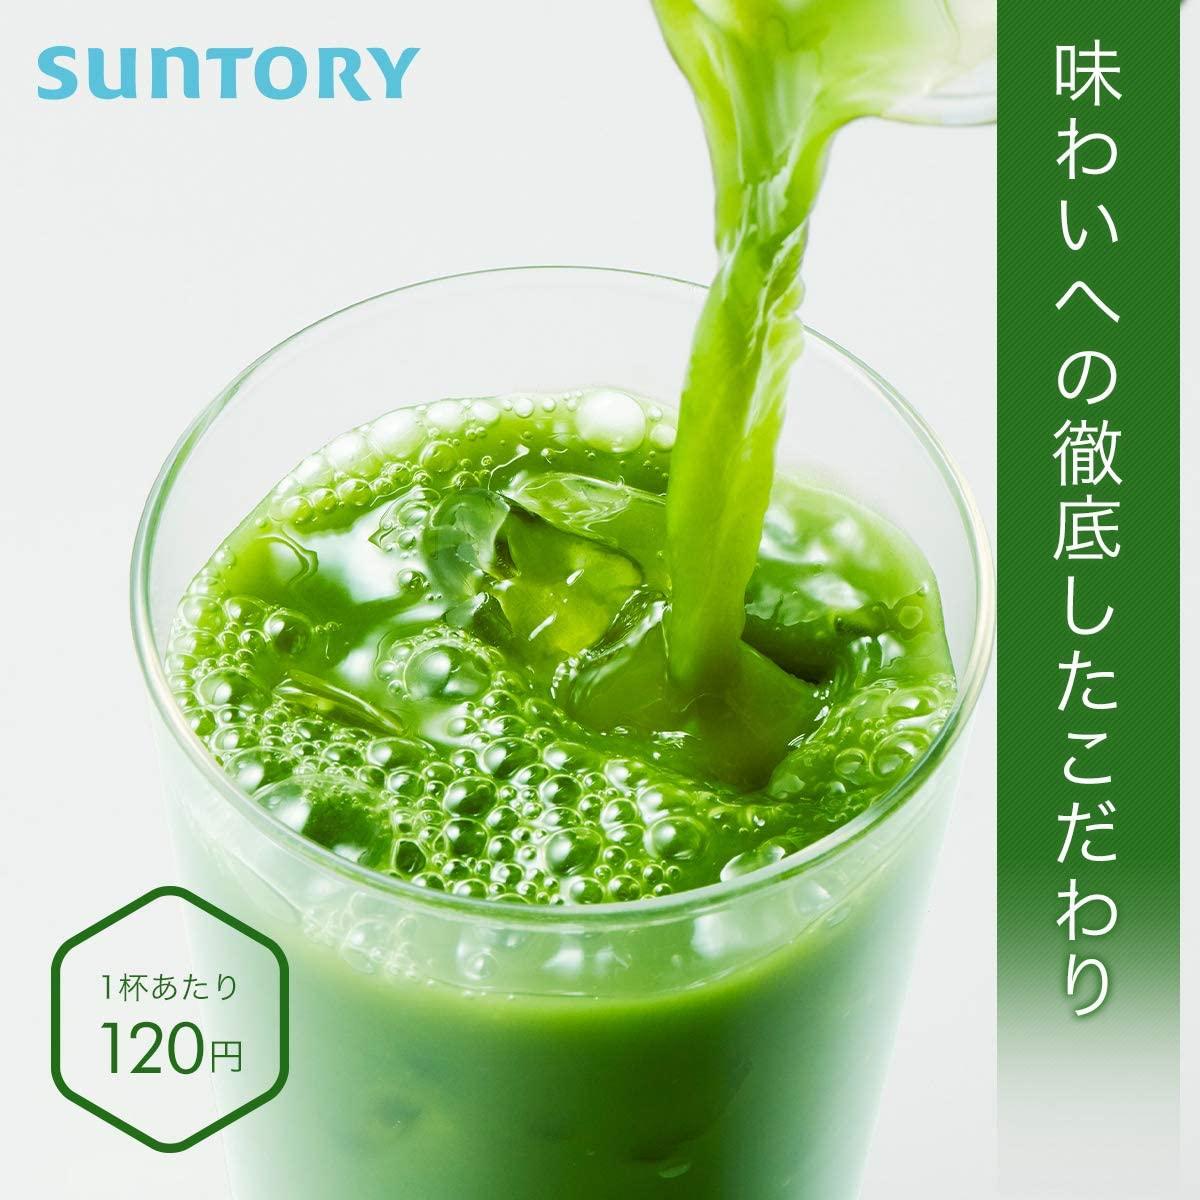 suntory(サントリー) 極の青汁の商品画像10